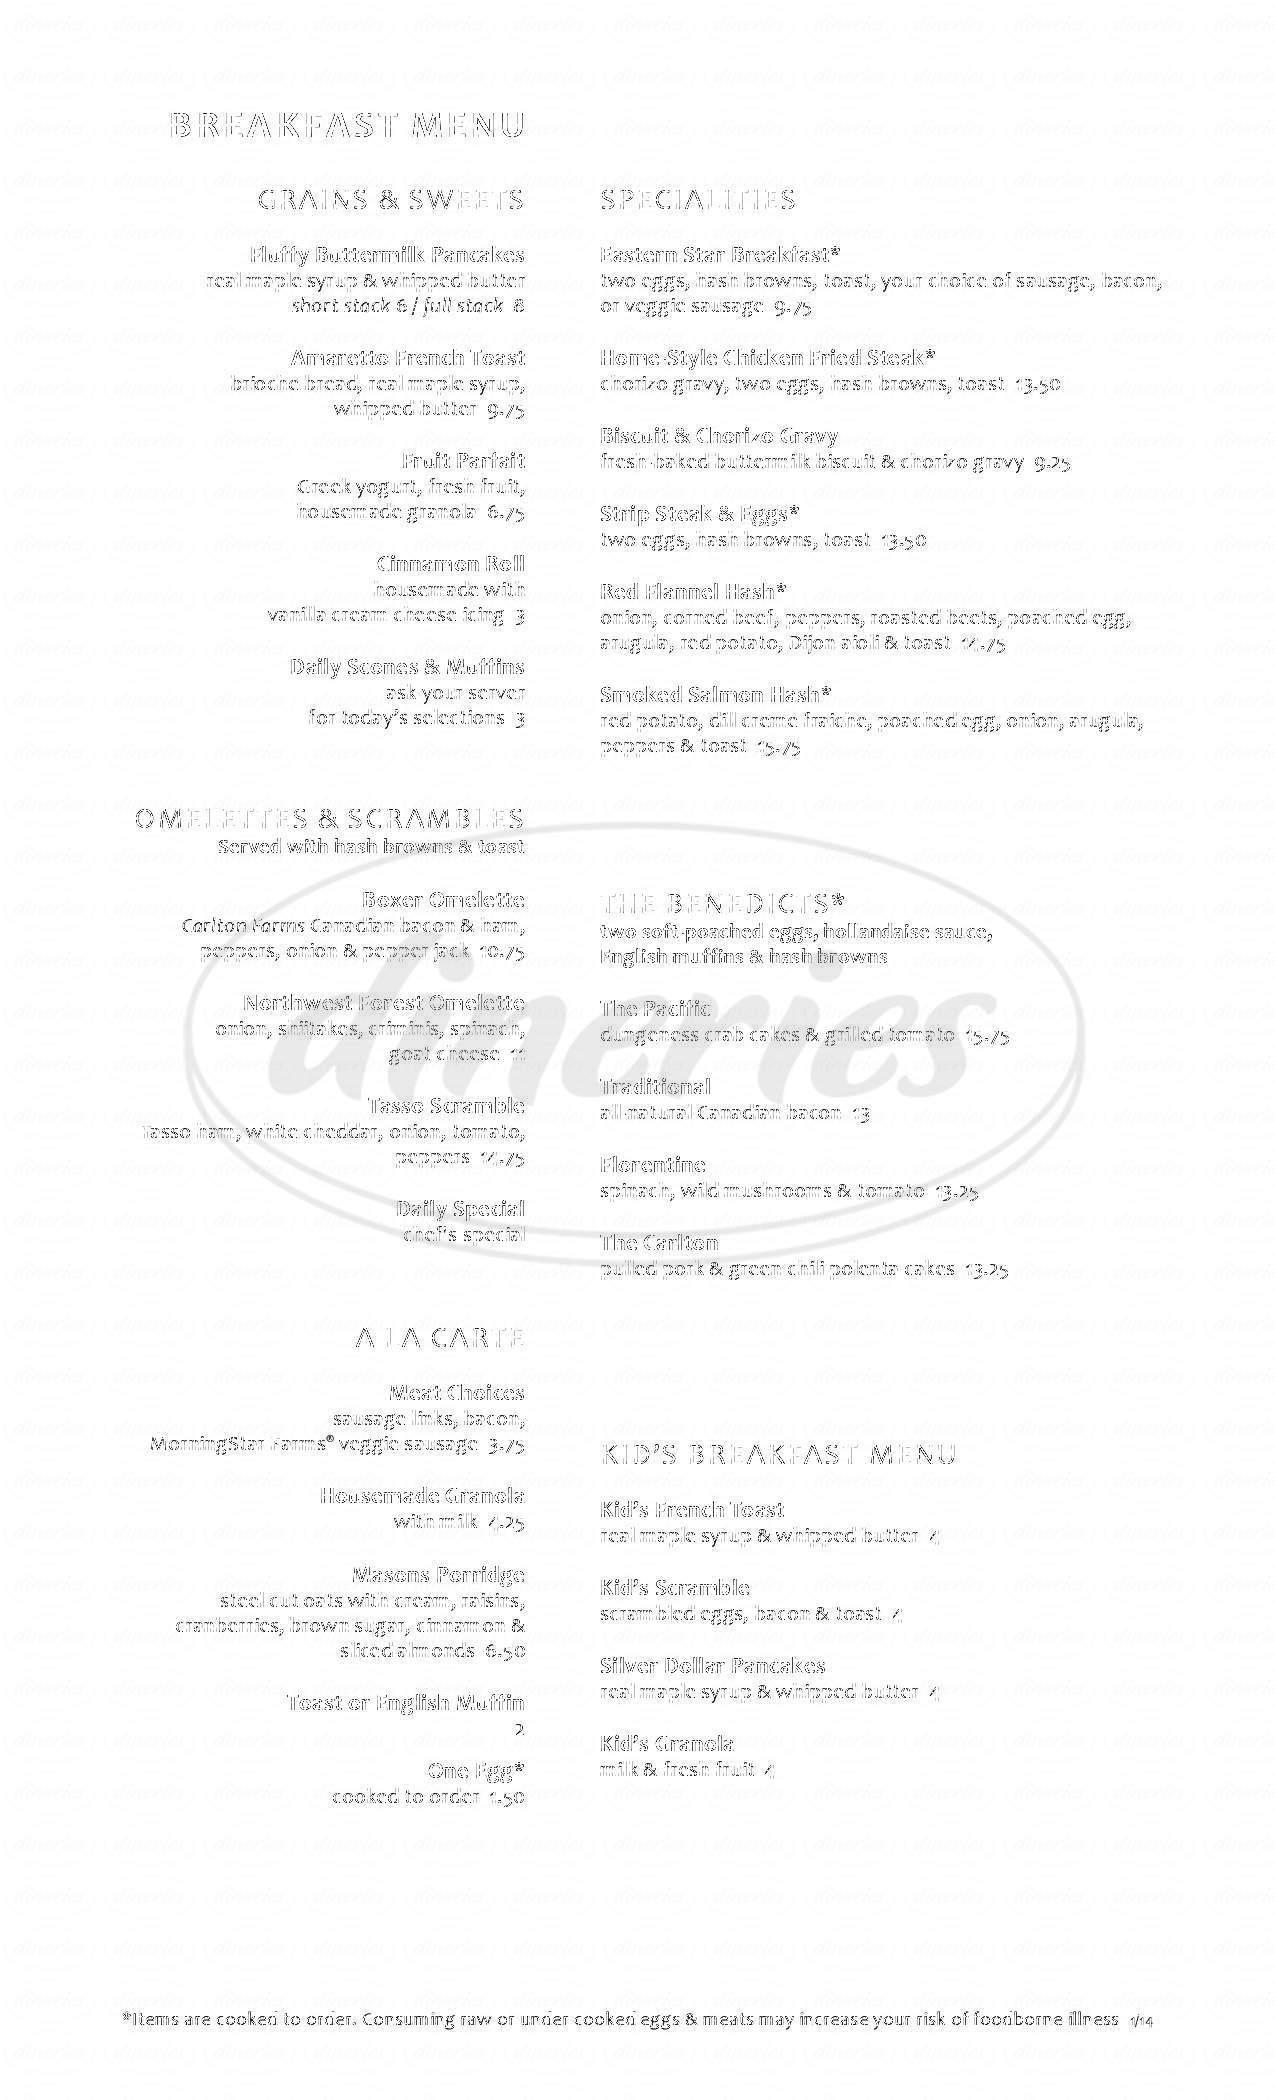 menu for McMenamins Ironwork Grill